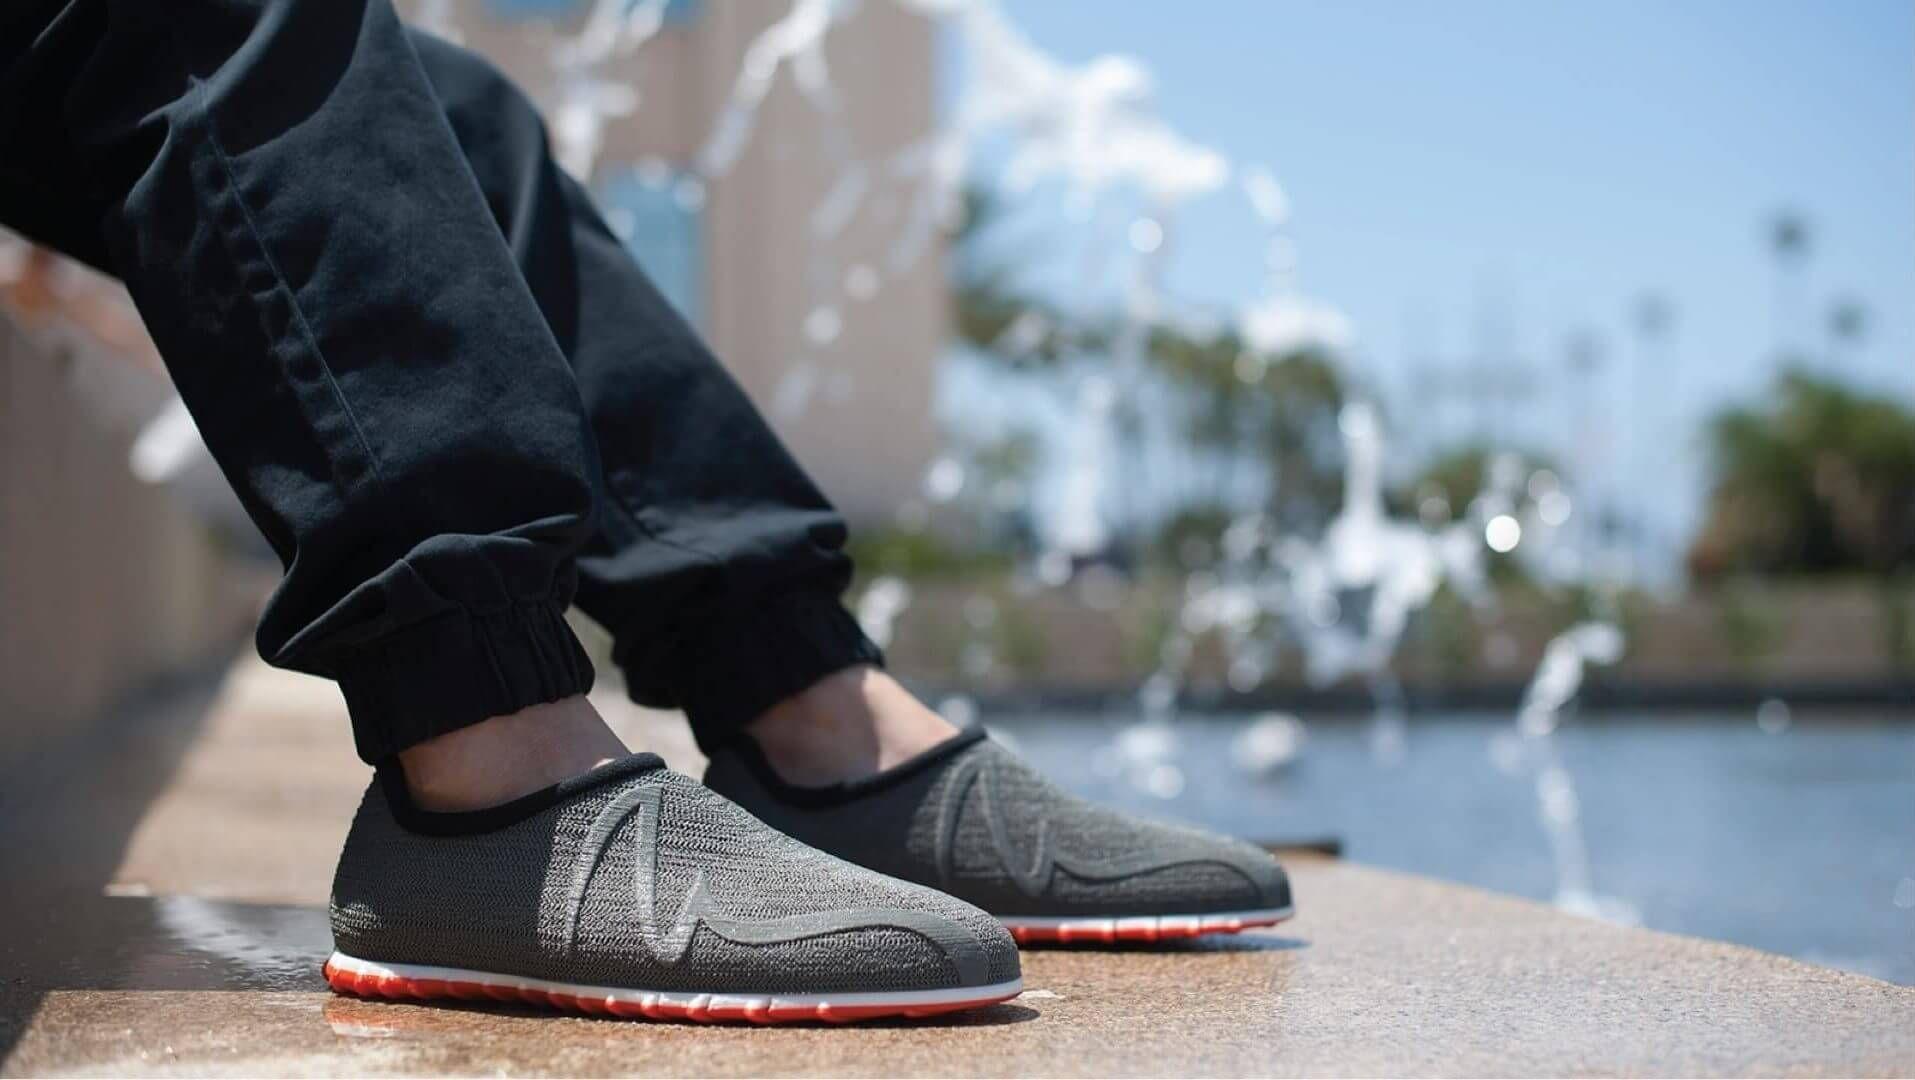 e feetz shoes